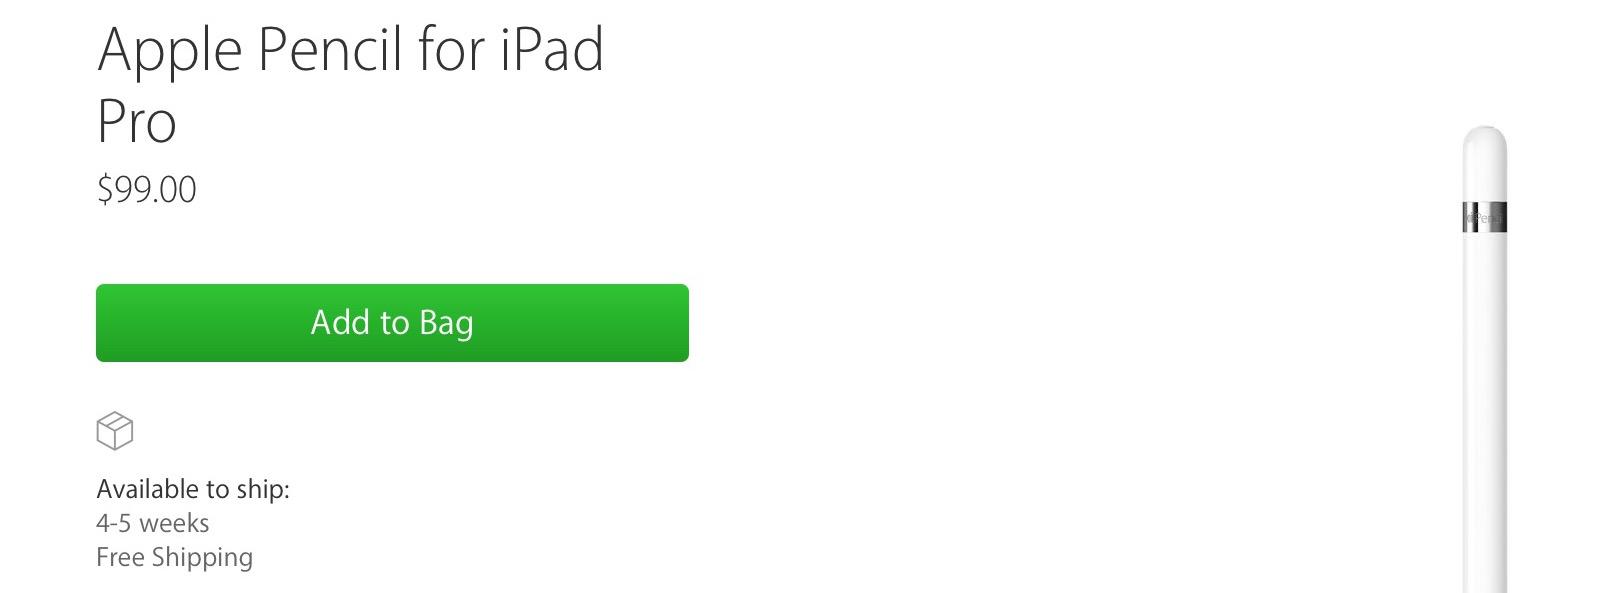 Apple Pencil for iPad Pro - Apple